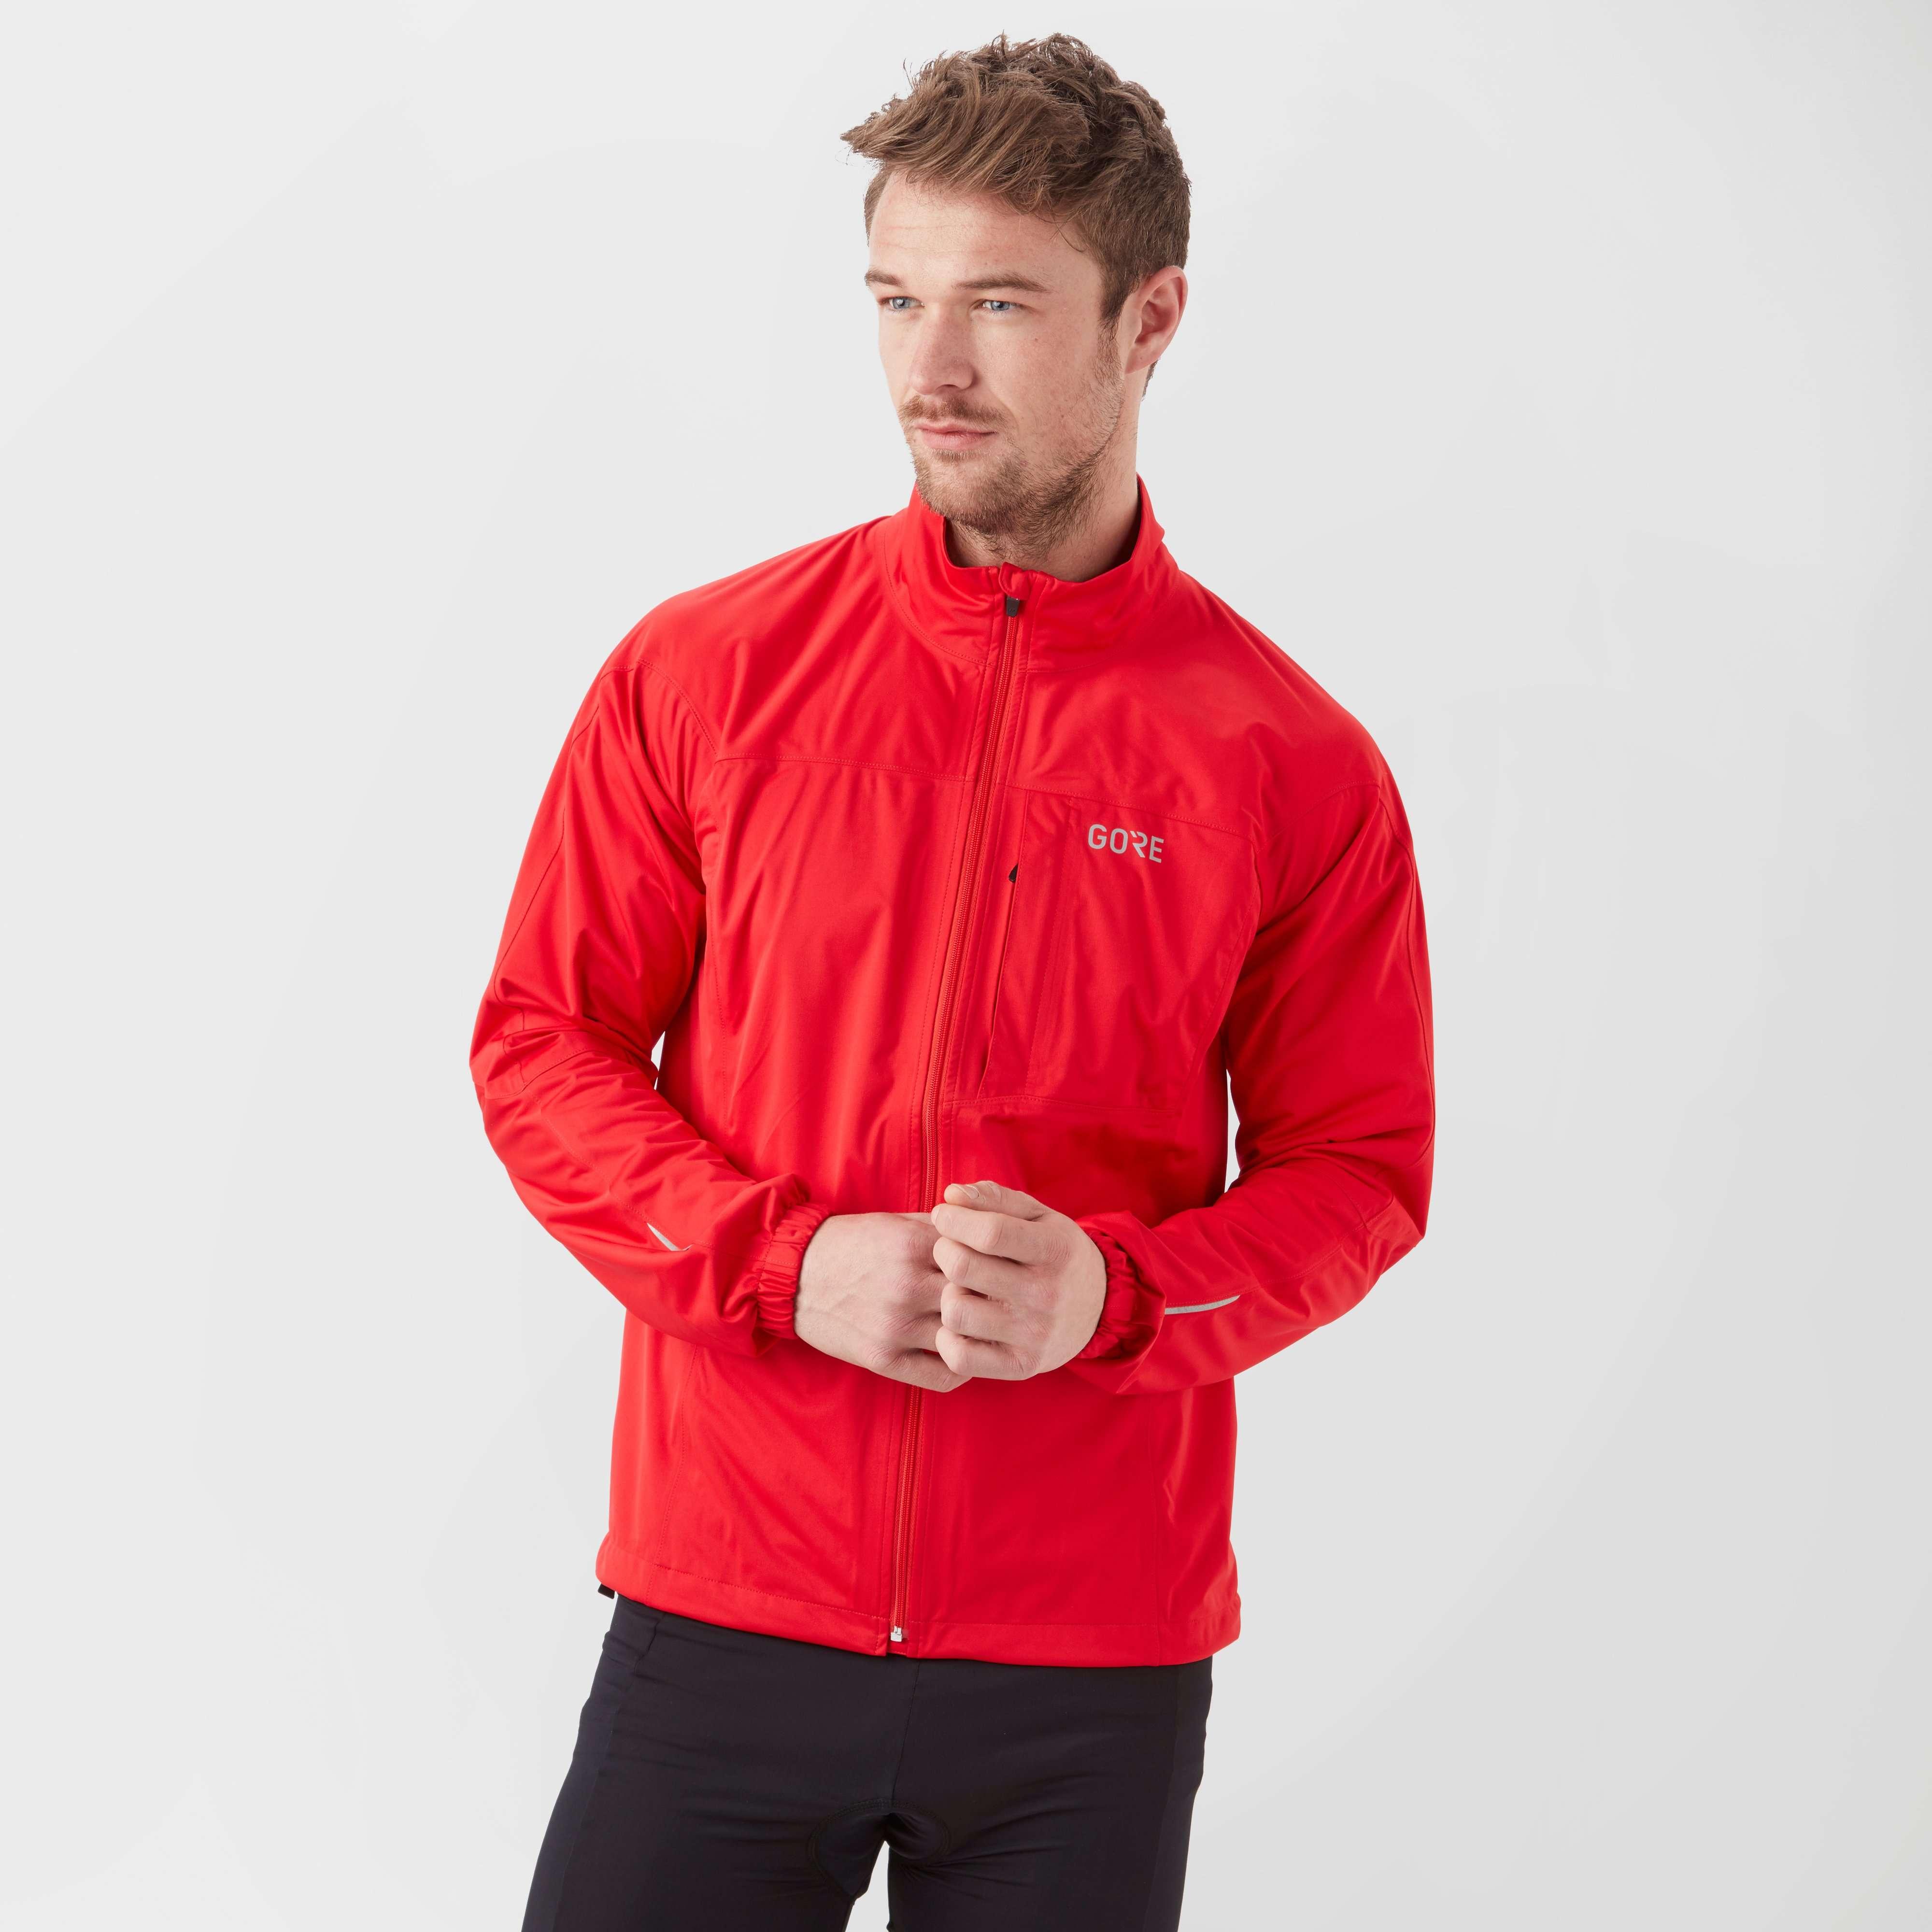 GORE Men's R3 GORE-TEX® Active Jacket